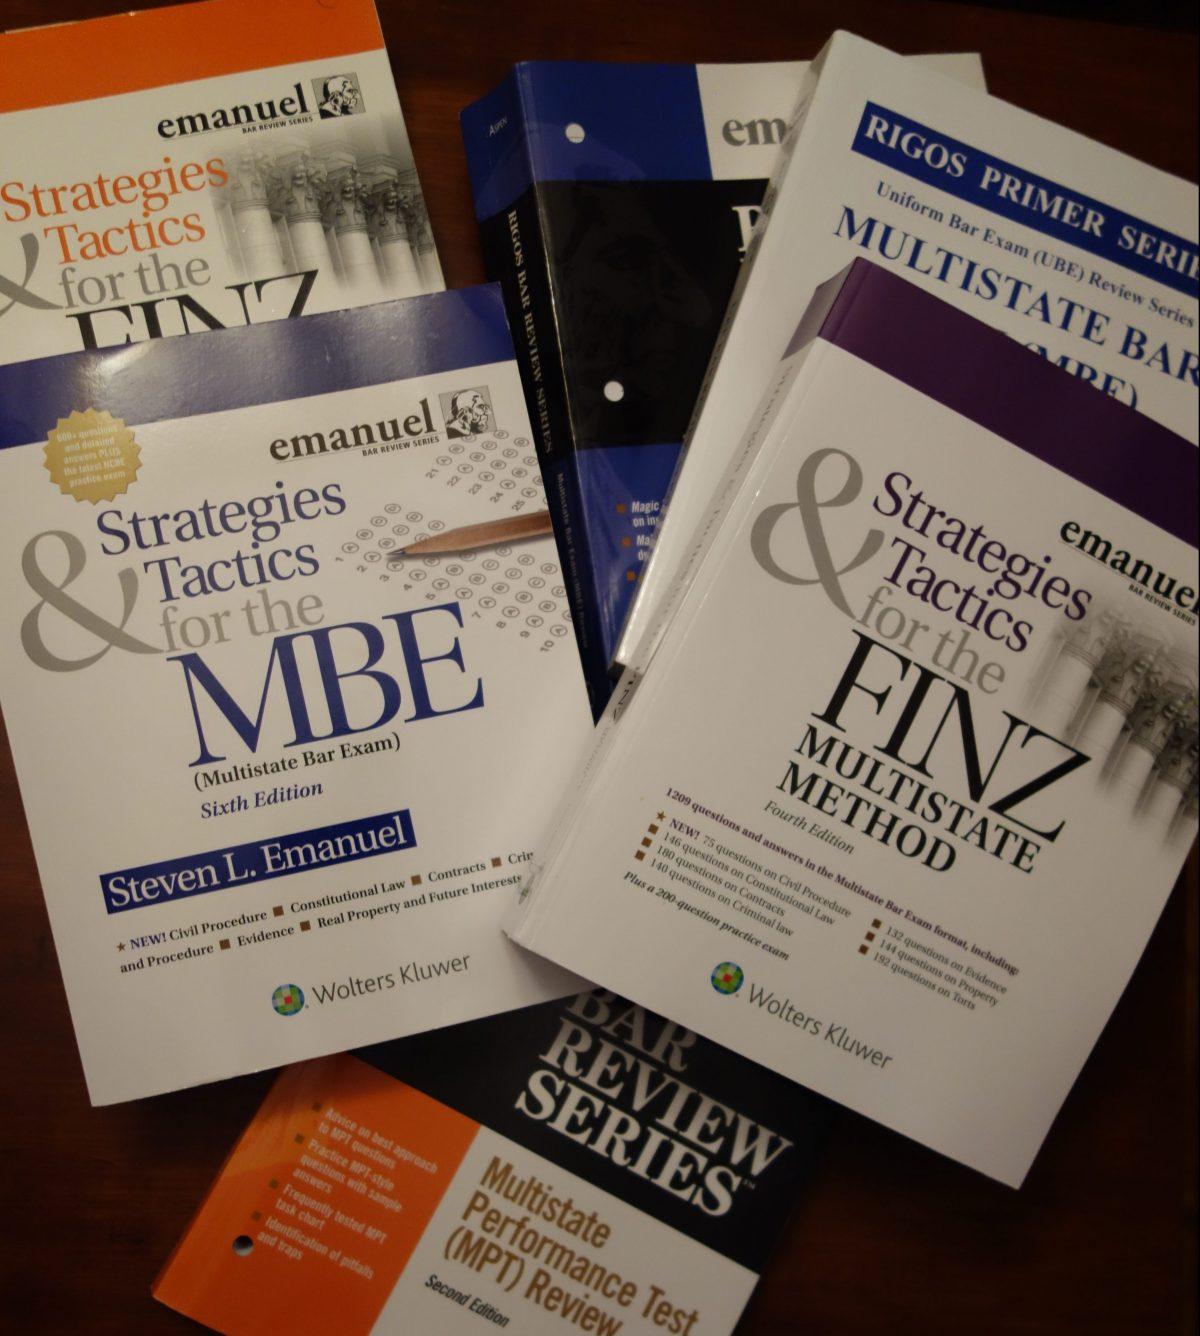 Bar Exam Preparation Materials – Advice from The Bar Professor